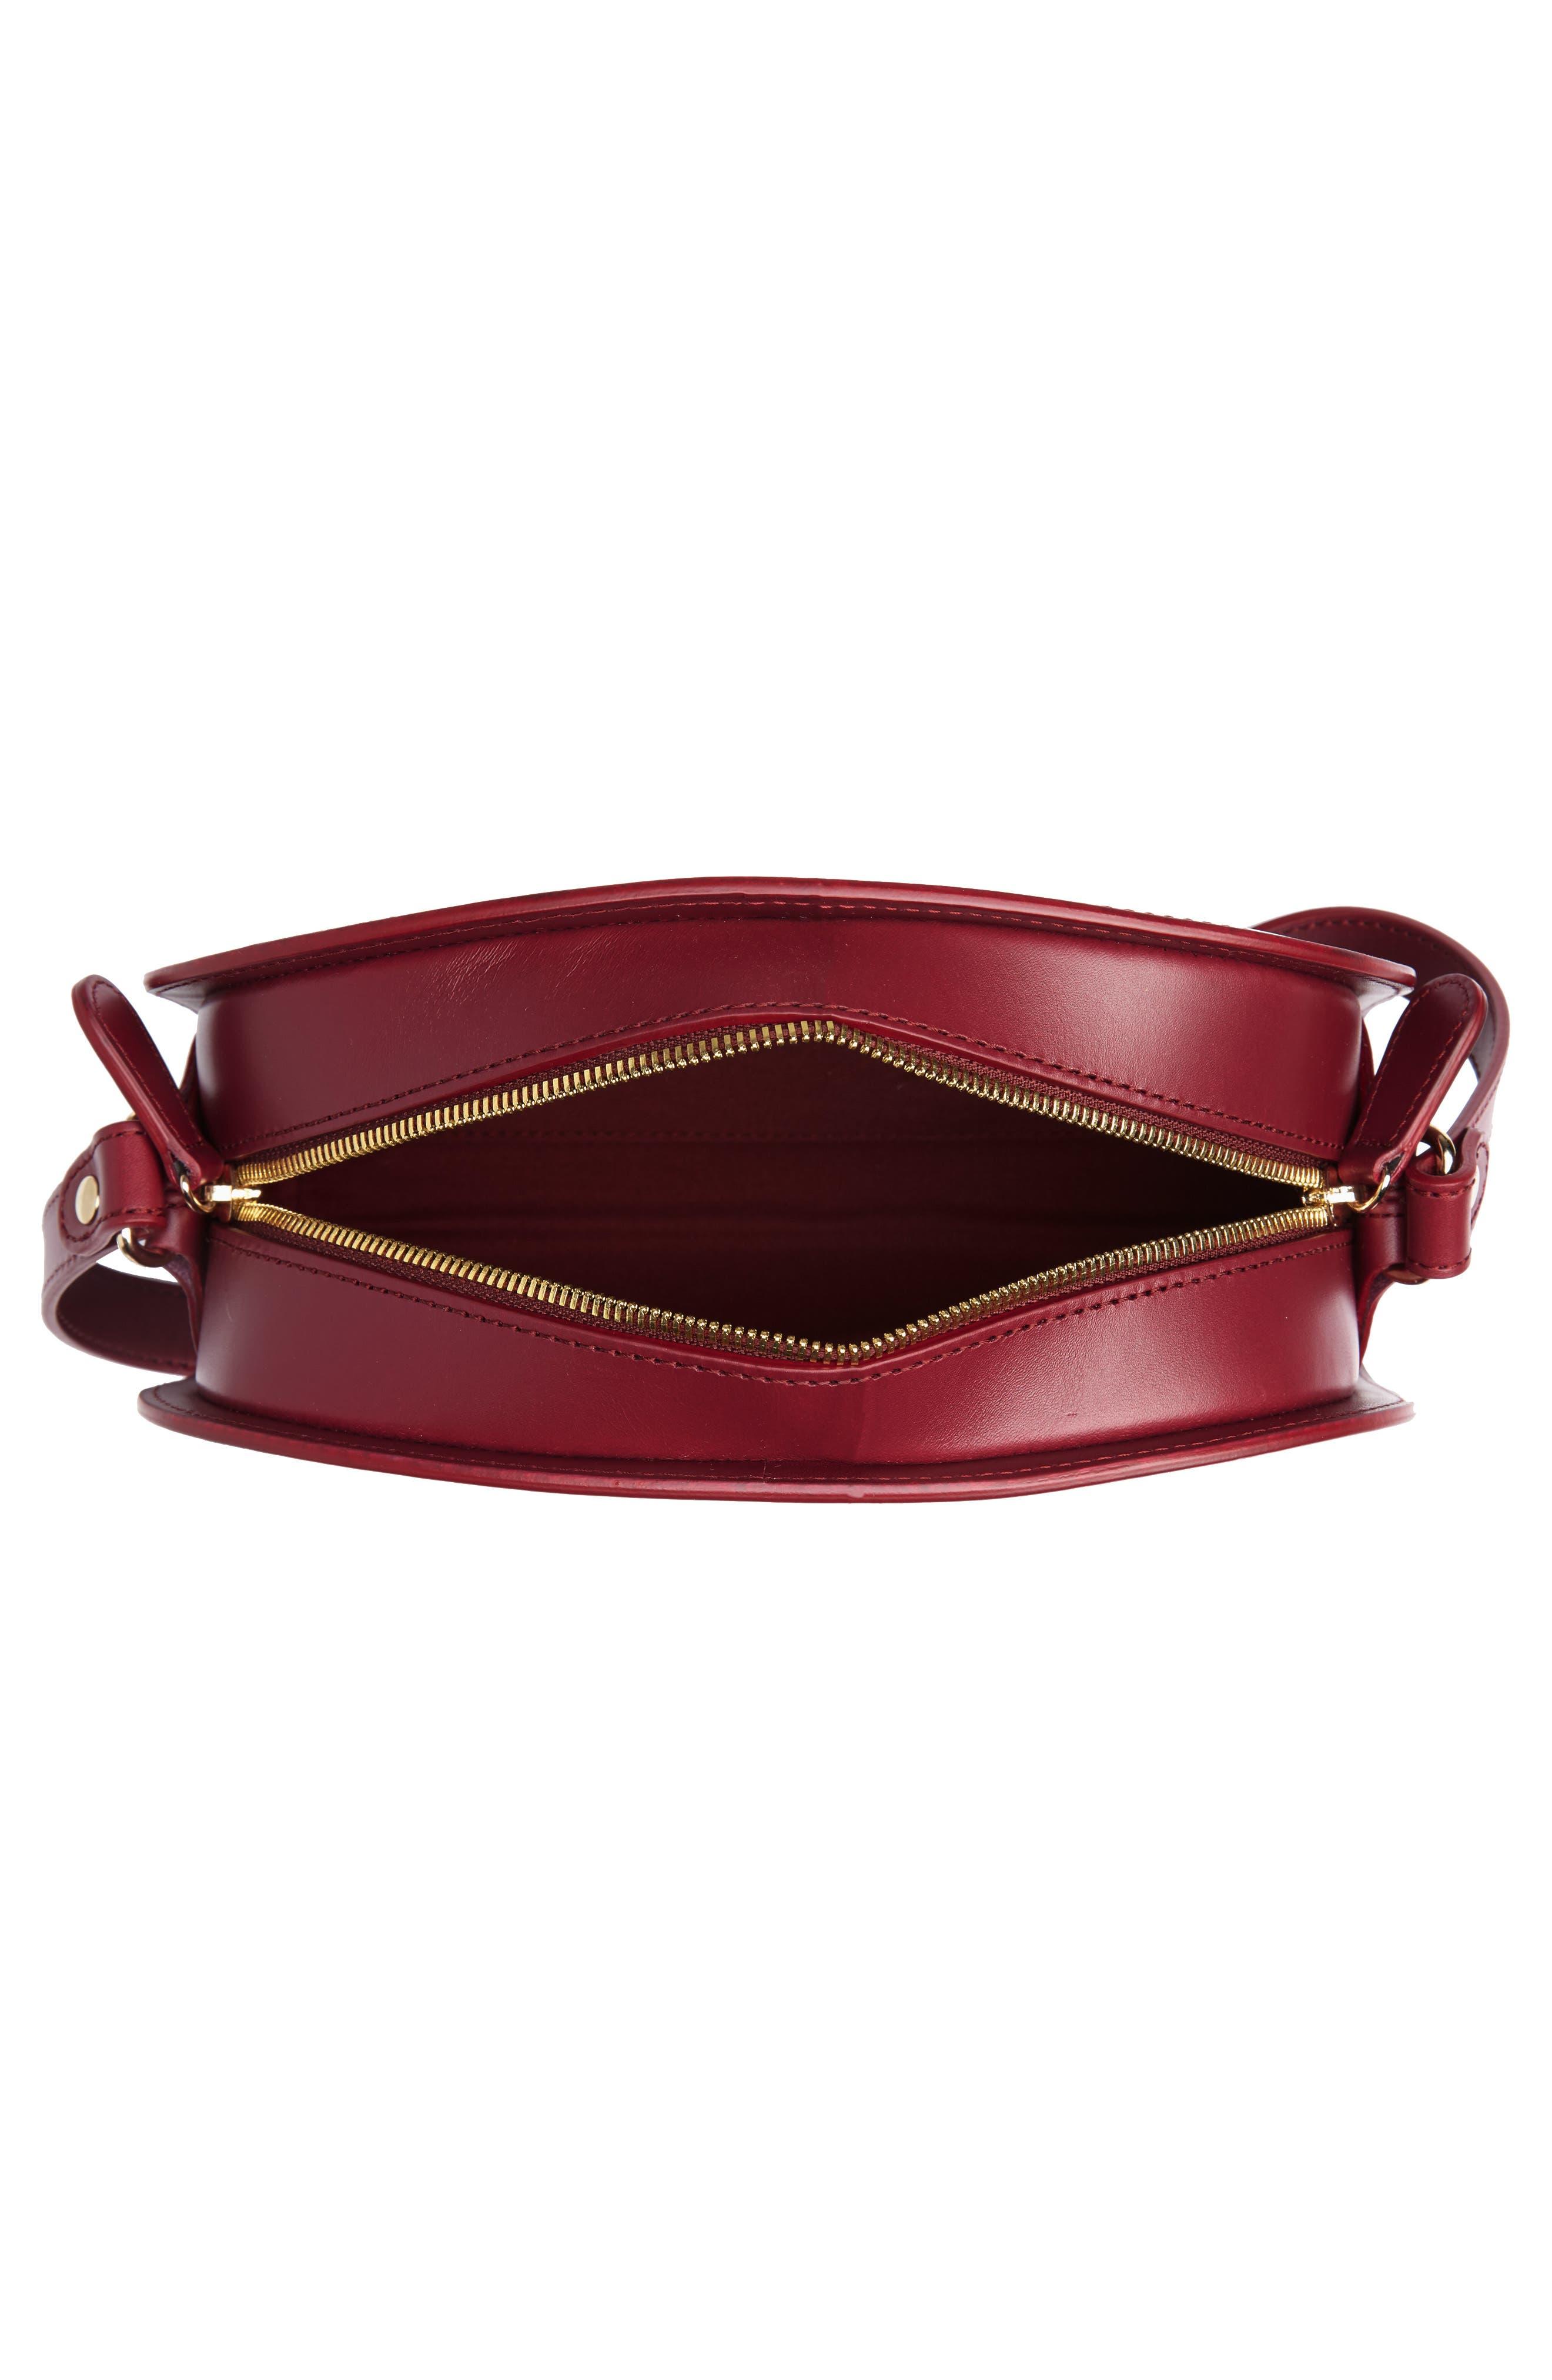 Sac Demi Lune Leather Crossbody Bag,                             Alternate thumbnail 4, color,                             FRAMBOISE